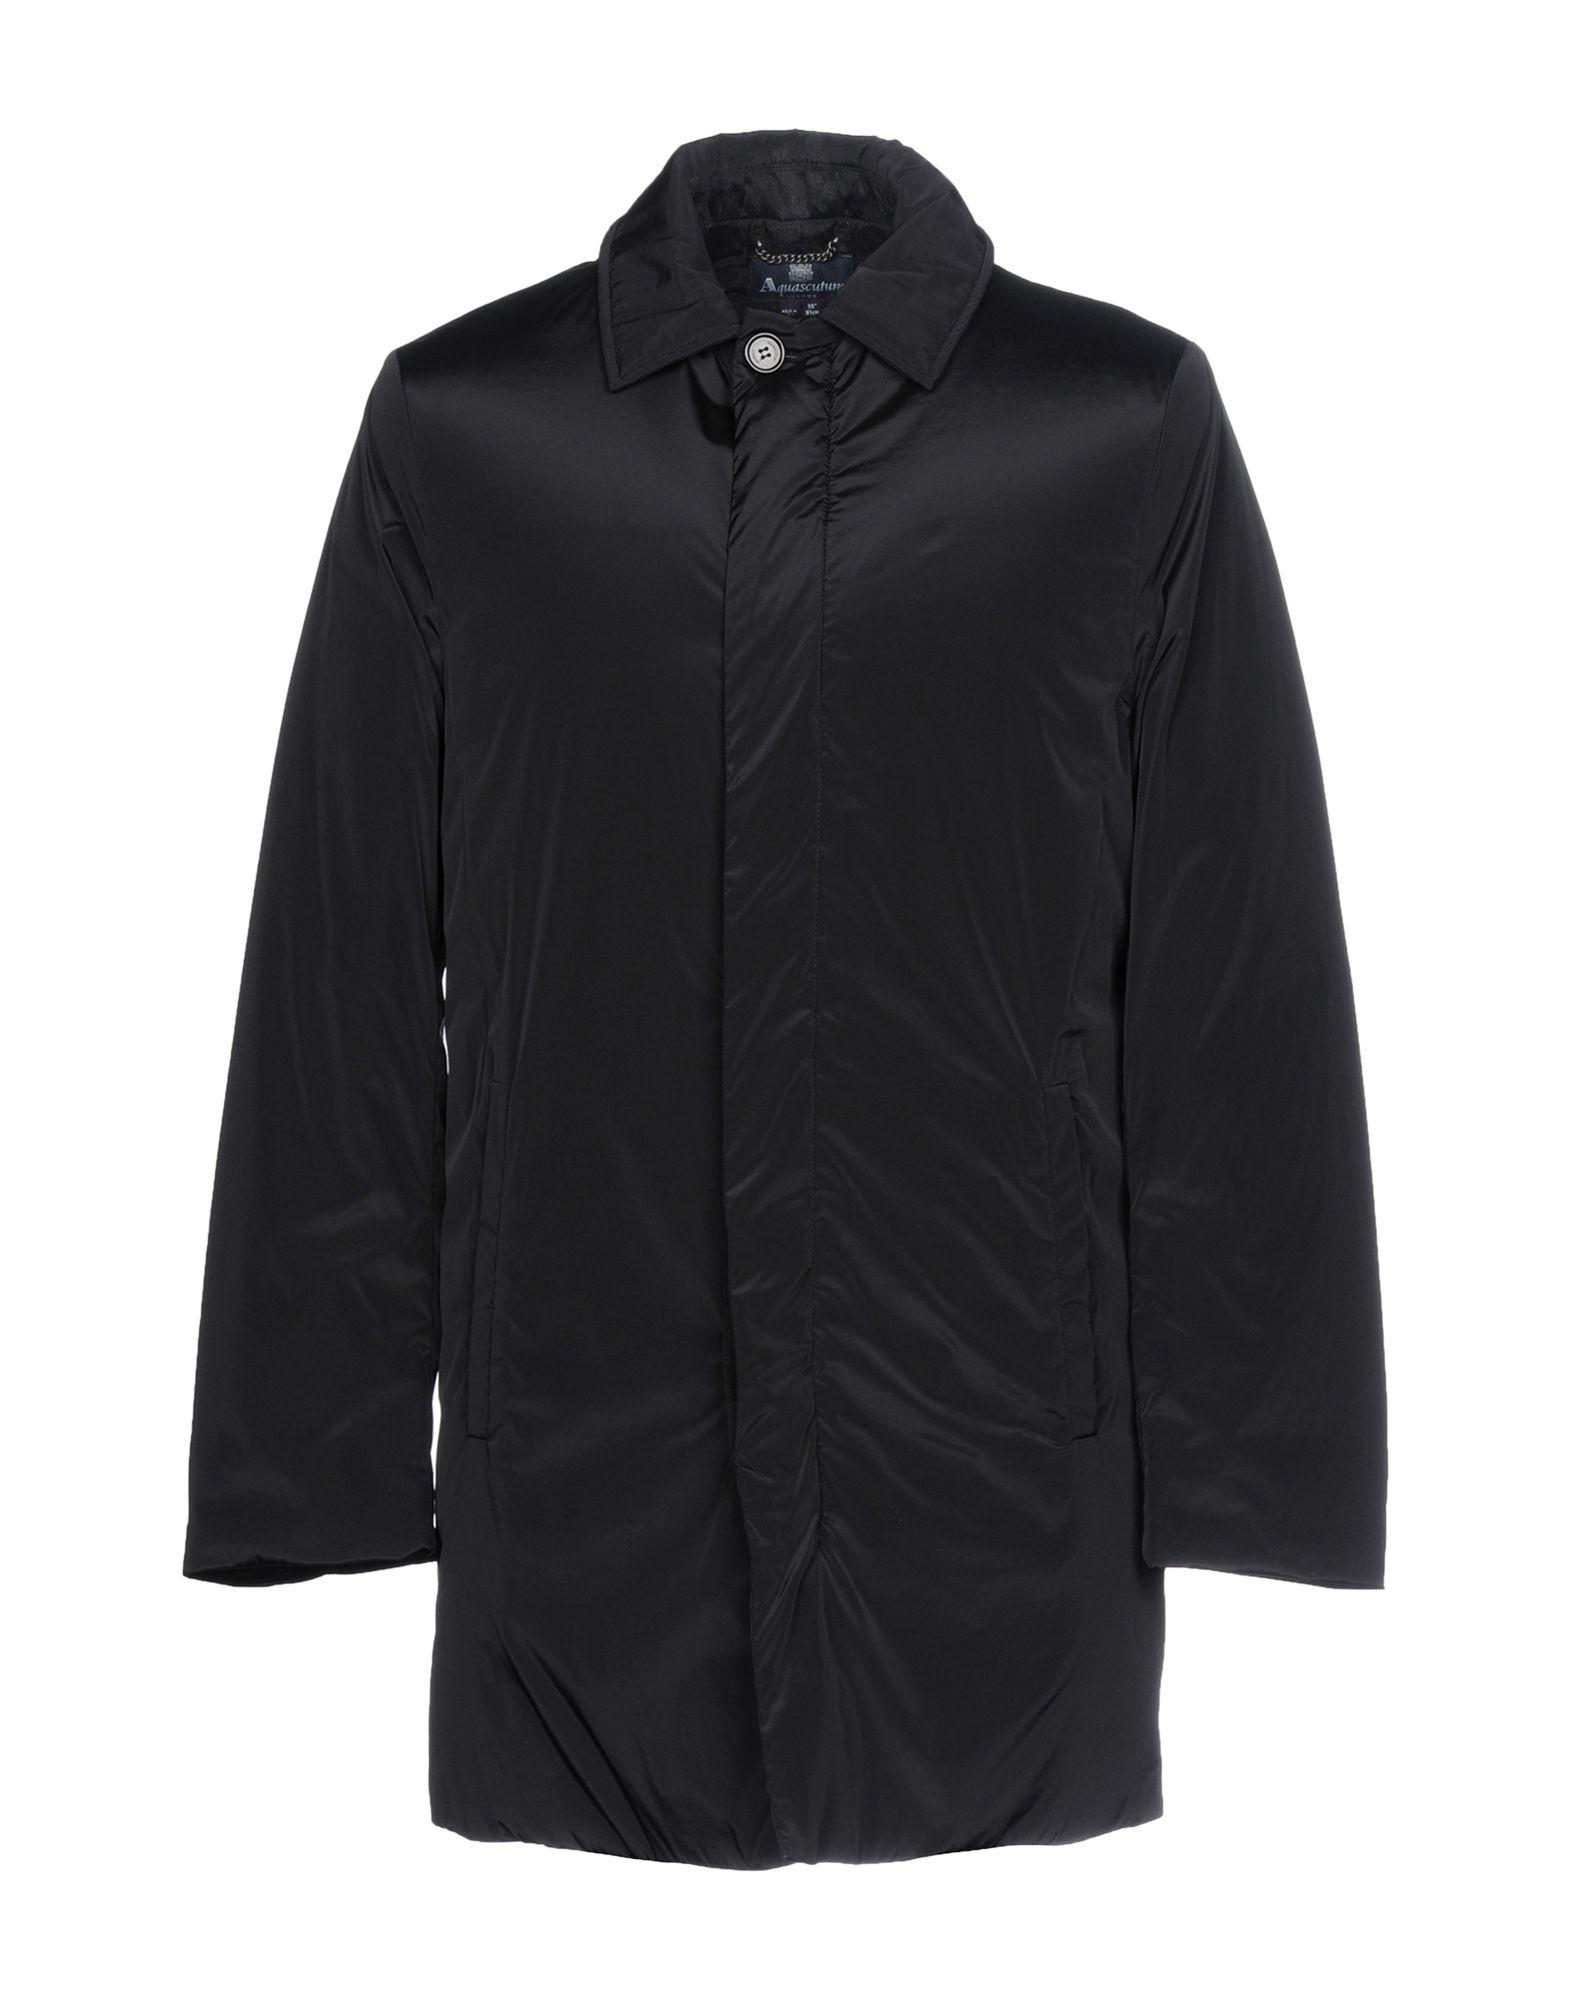 AQUASCUTUM Jacket in Black